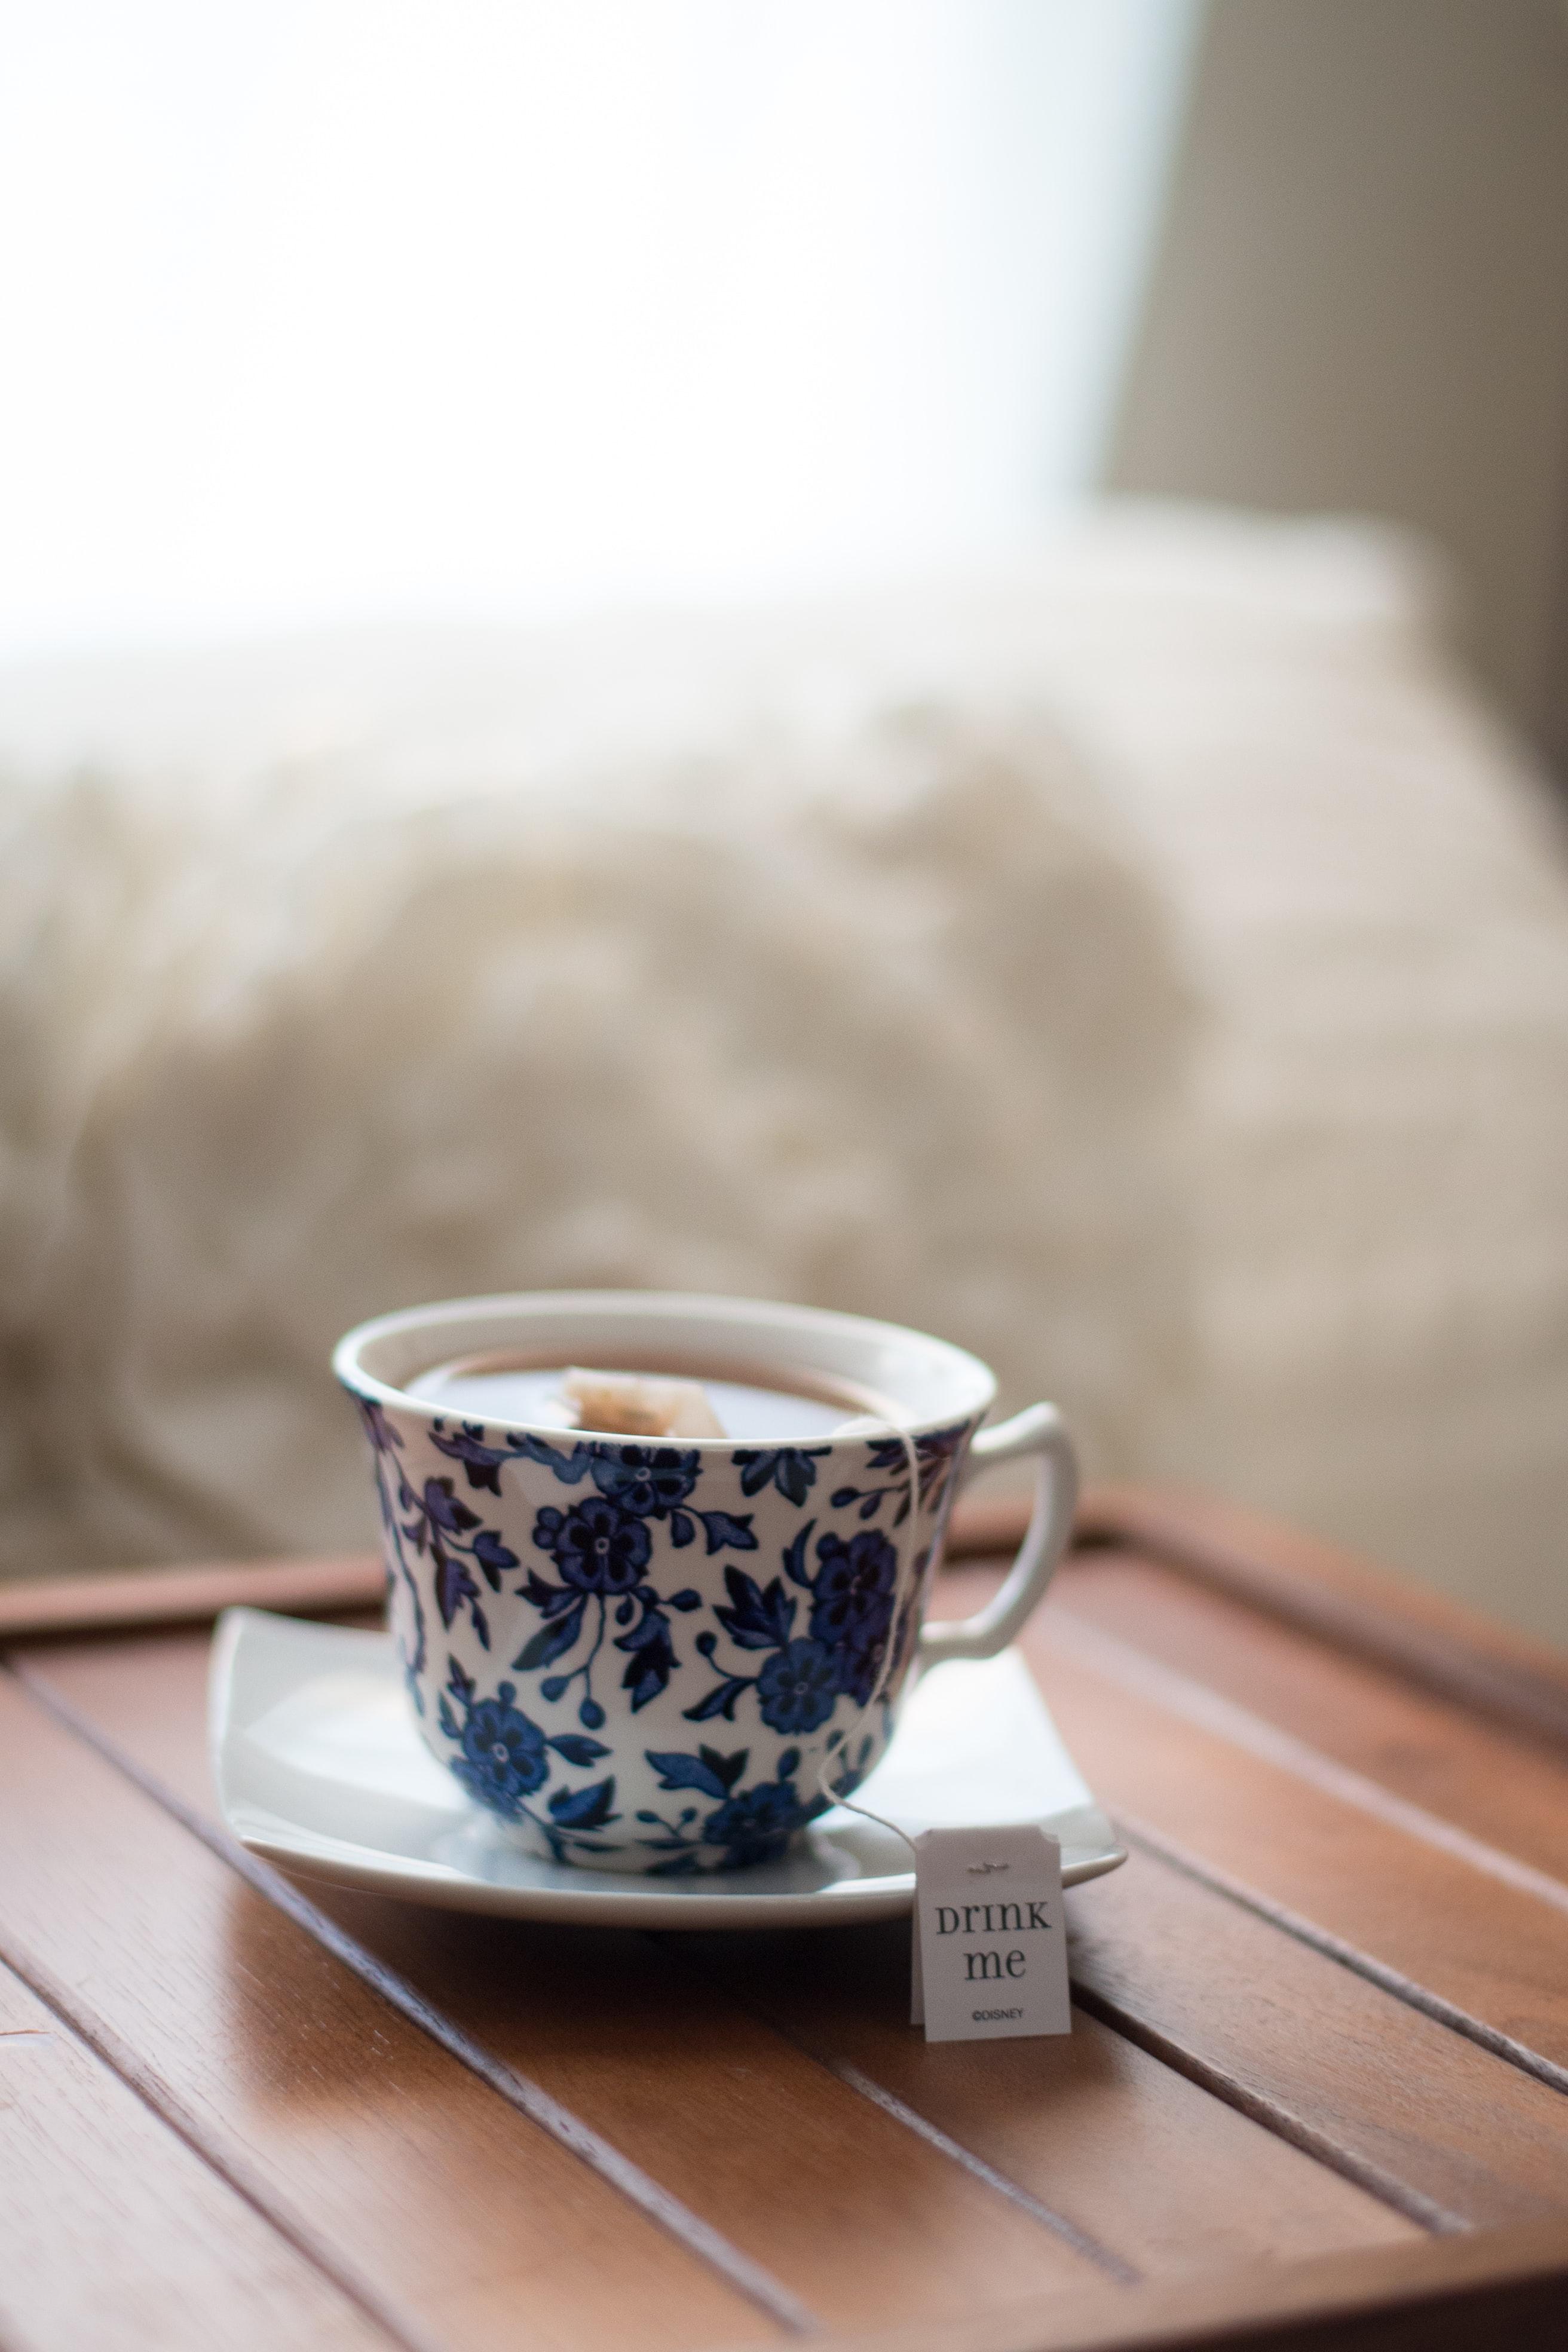 Tea please!